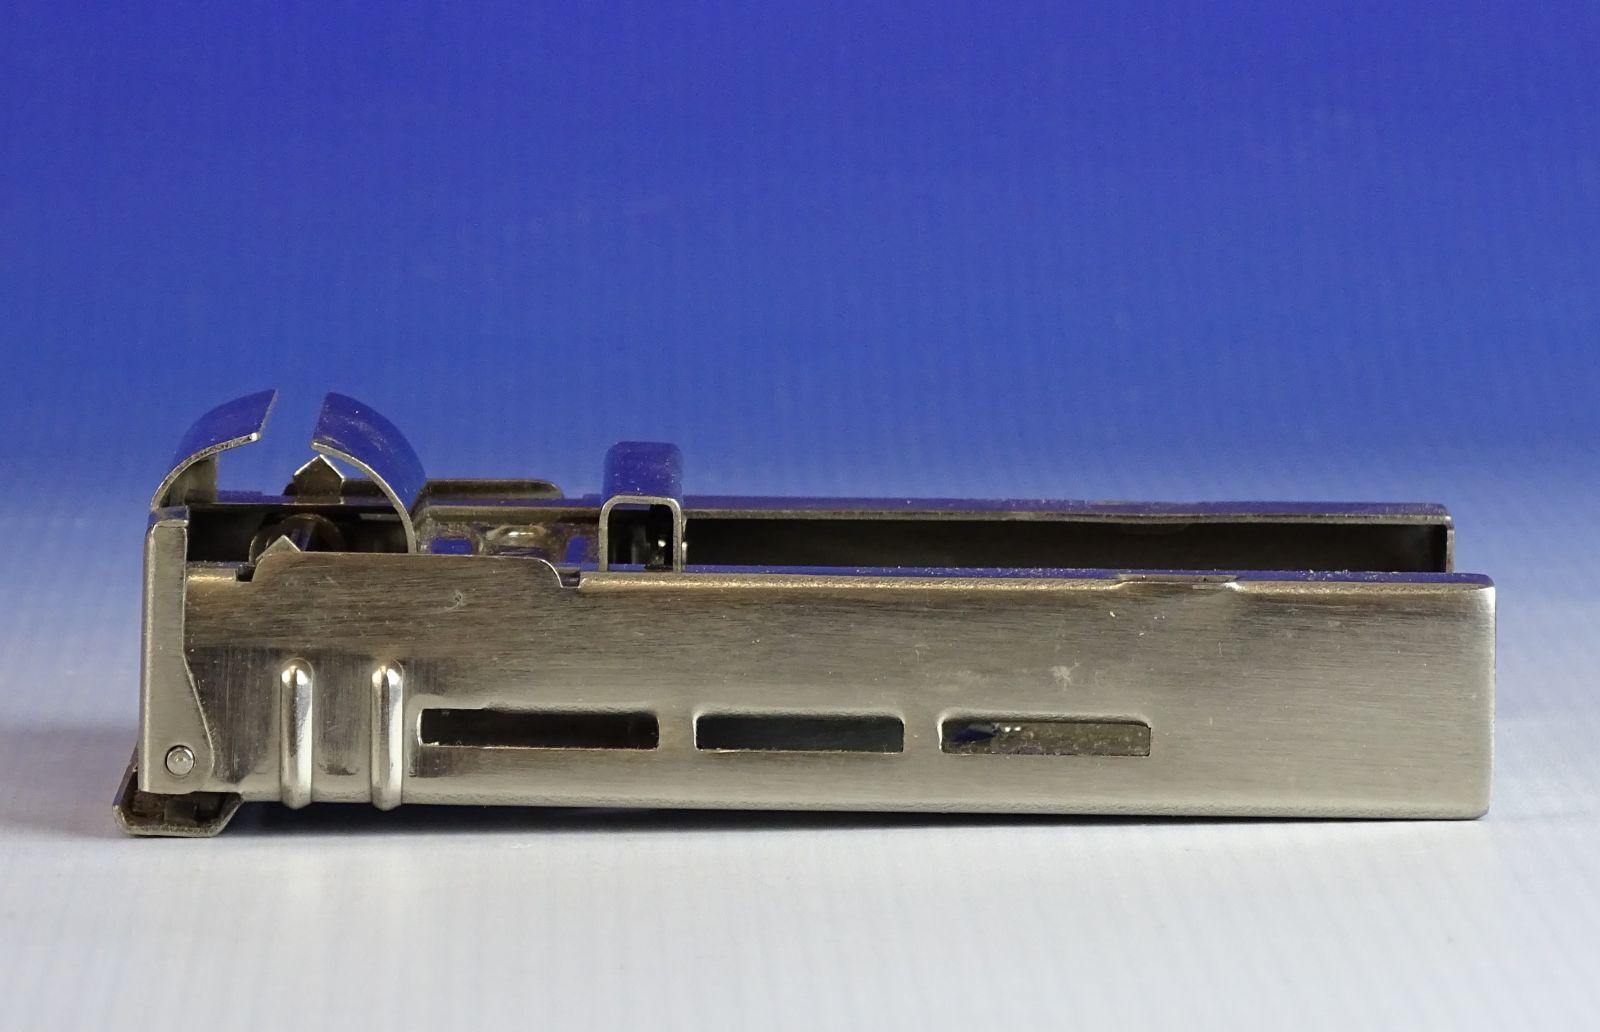 DSC06942.JPG (1600×1032)